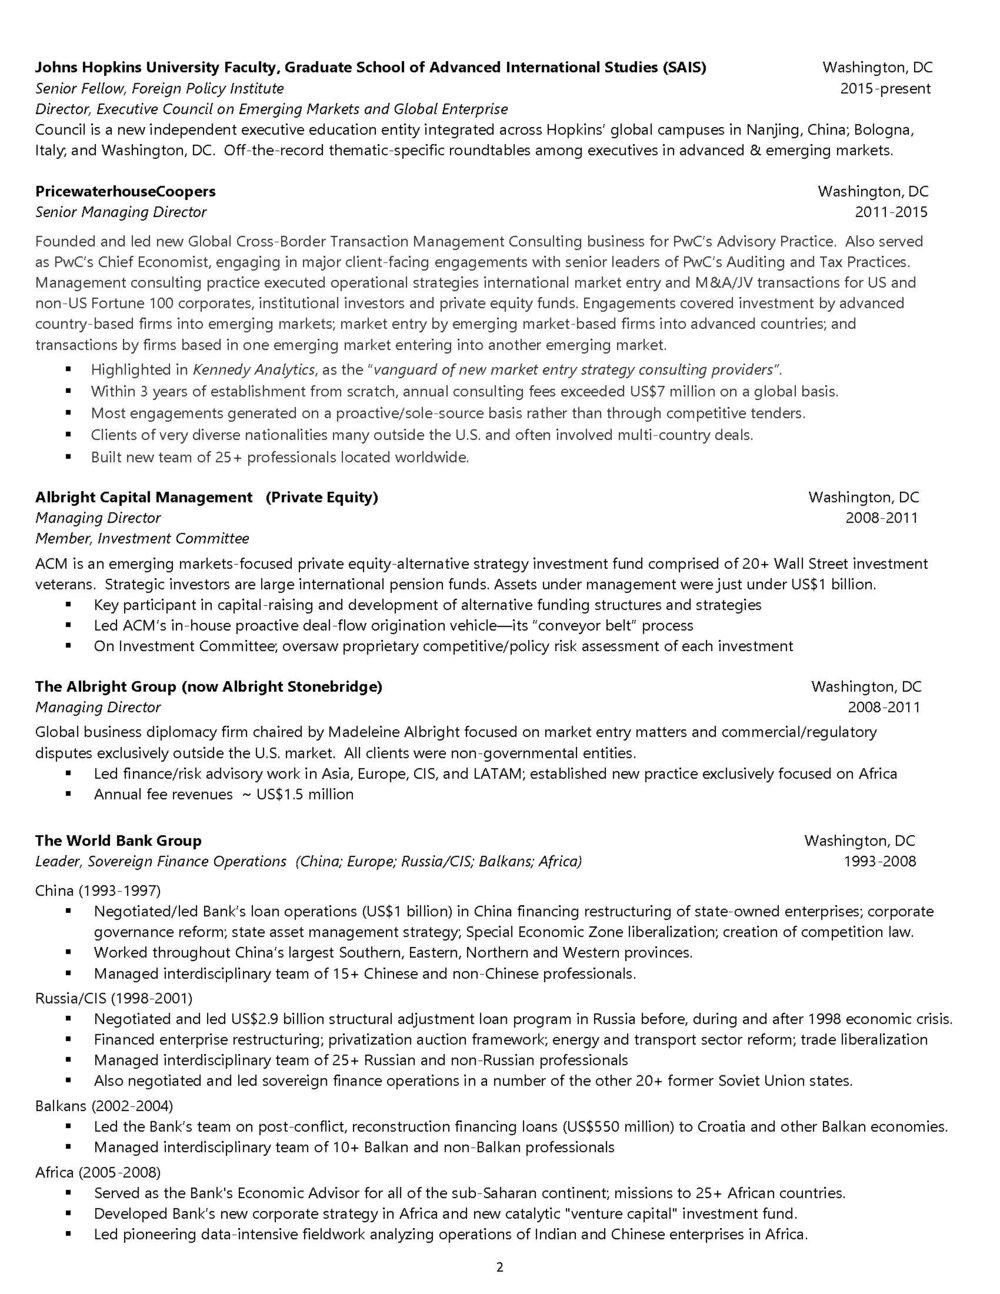 Broadman Detailed CV 3-21-18_Page_2.jpg